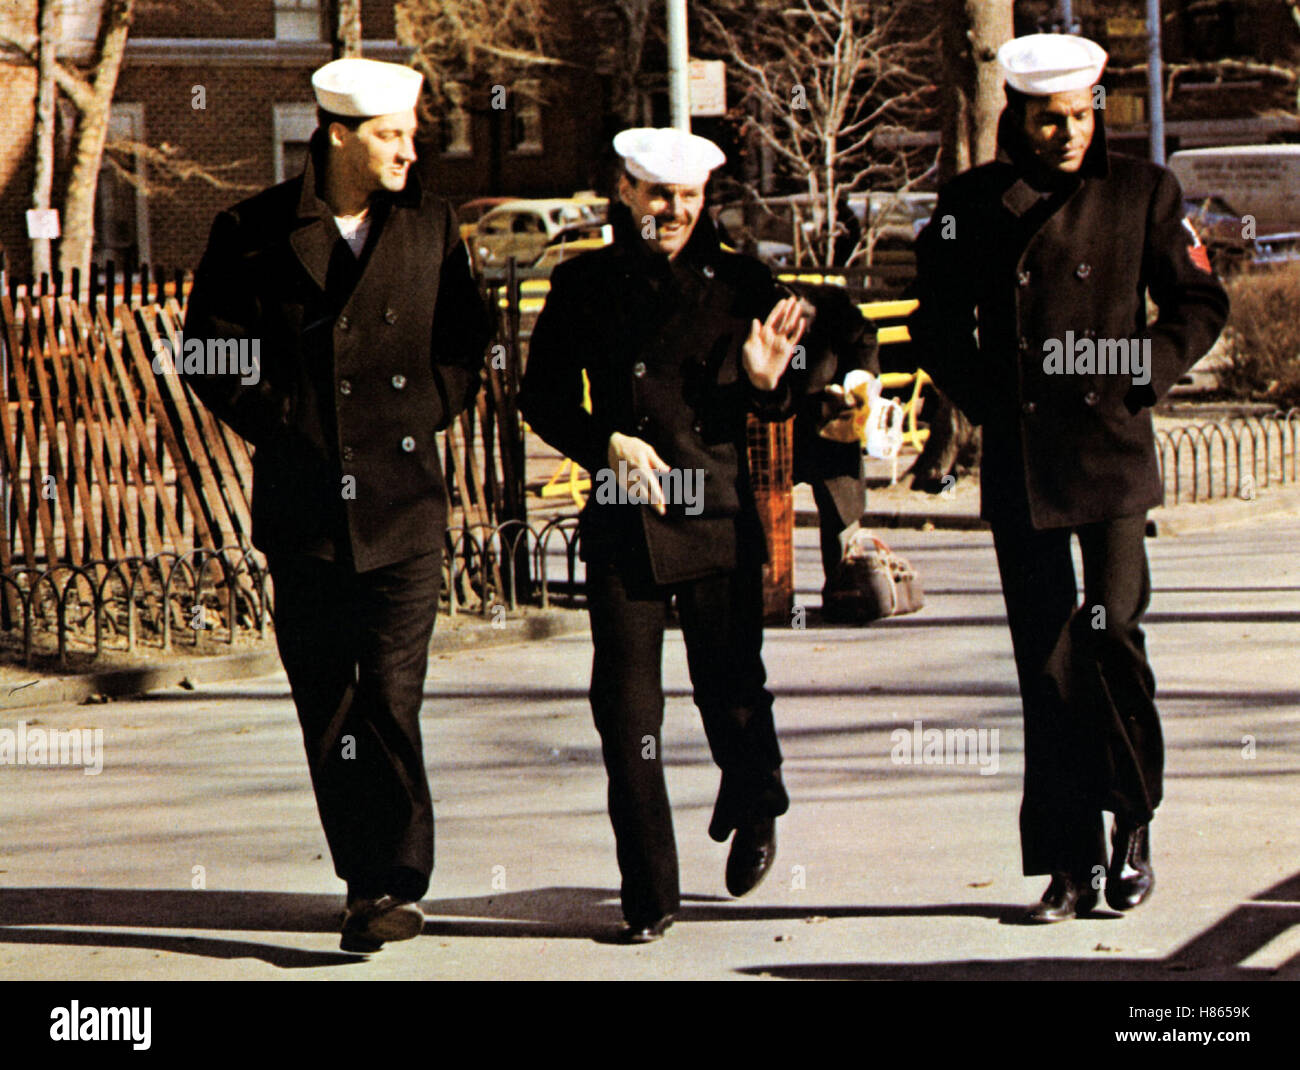 Das letzte Kommando, (THE LAST DETAIL) USA 1973, Regie: Hal Ashby, RANDY QUAID, JACK NICHOLSON, OTIS YOUNG, Stichwort: - Stock Image